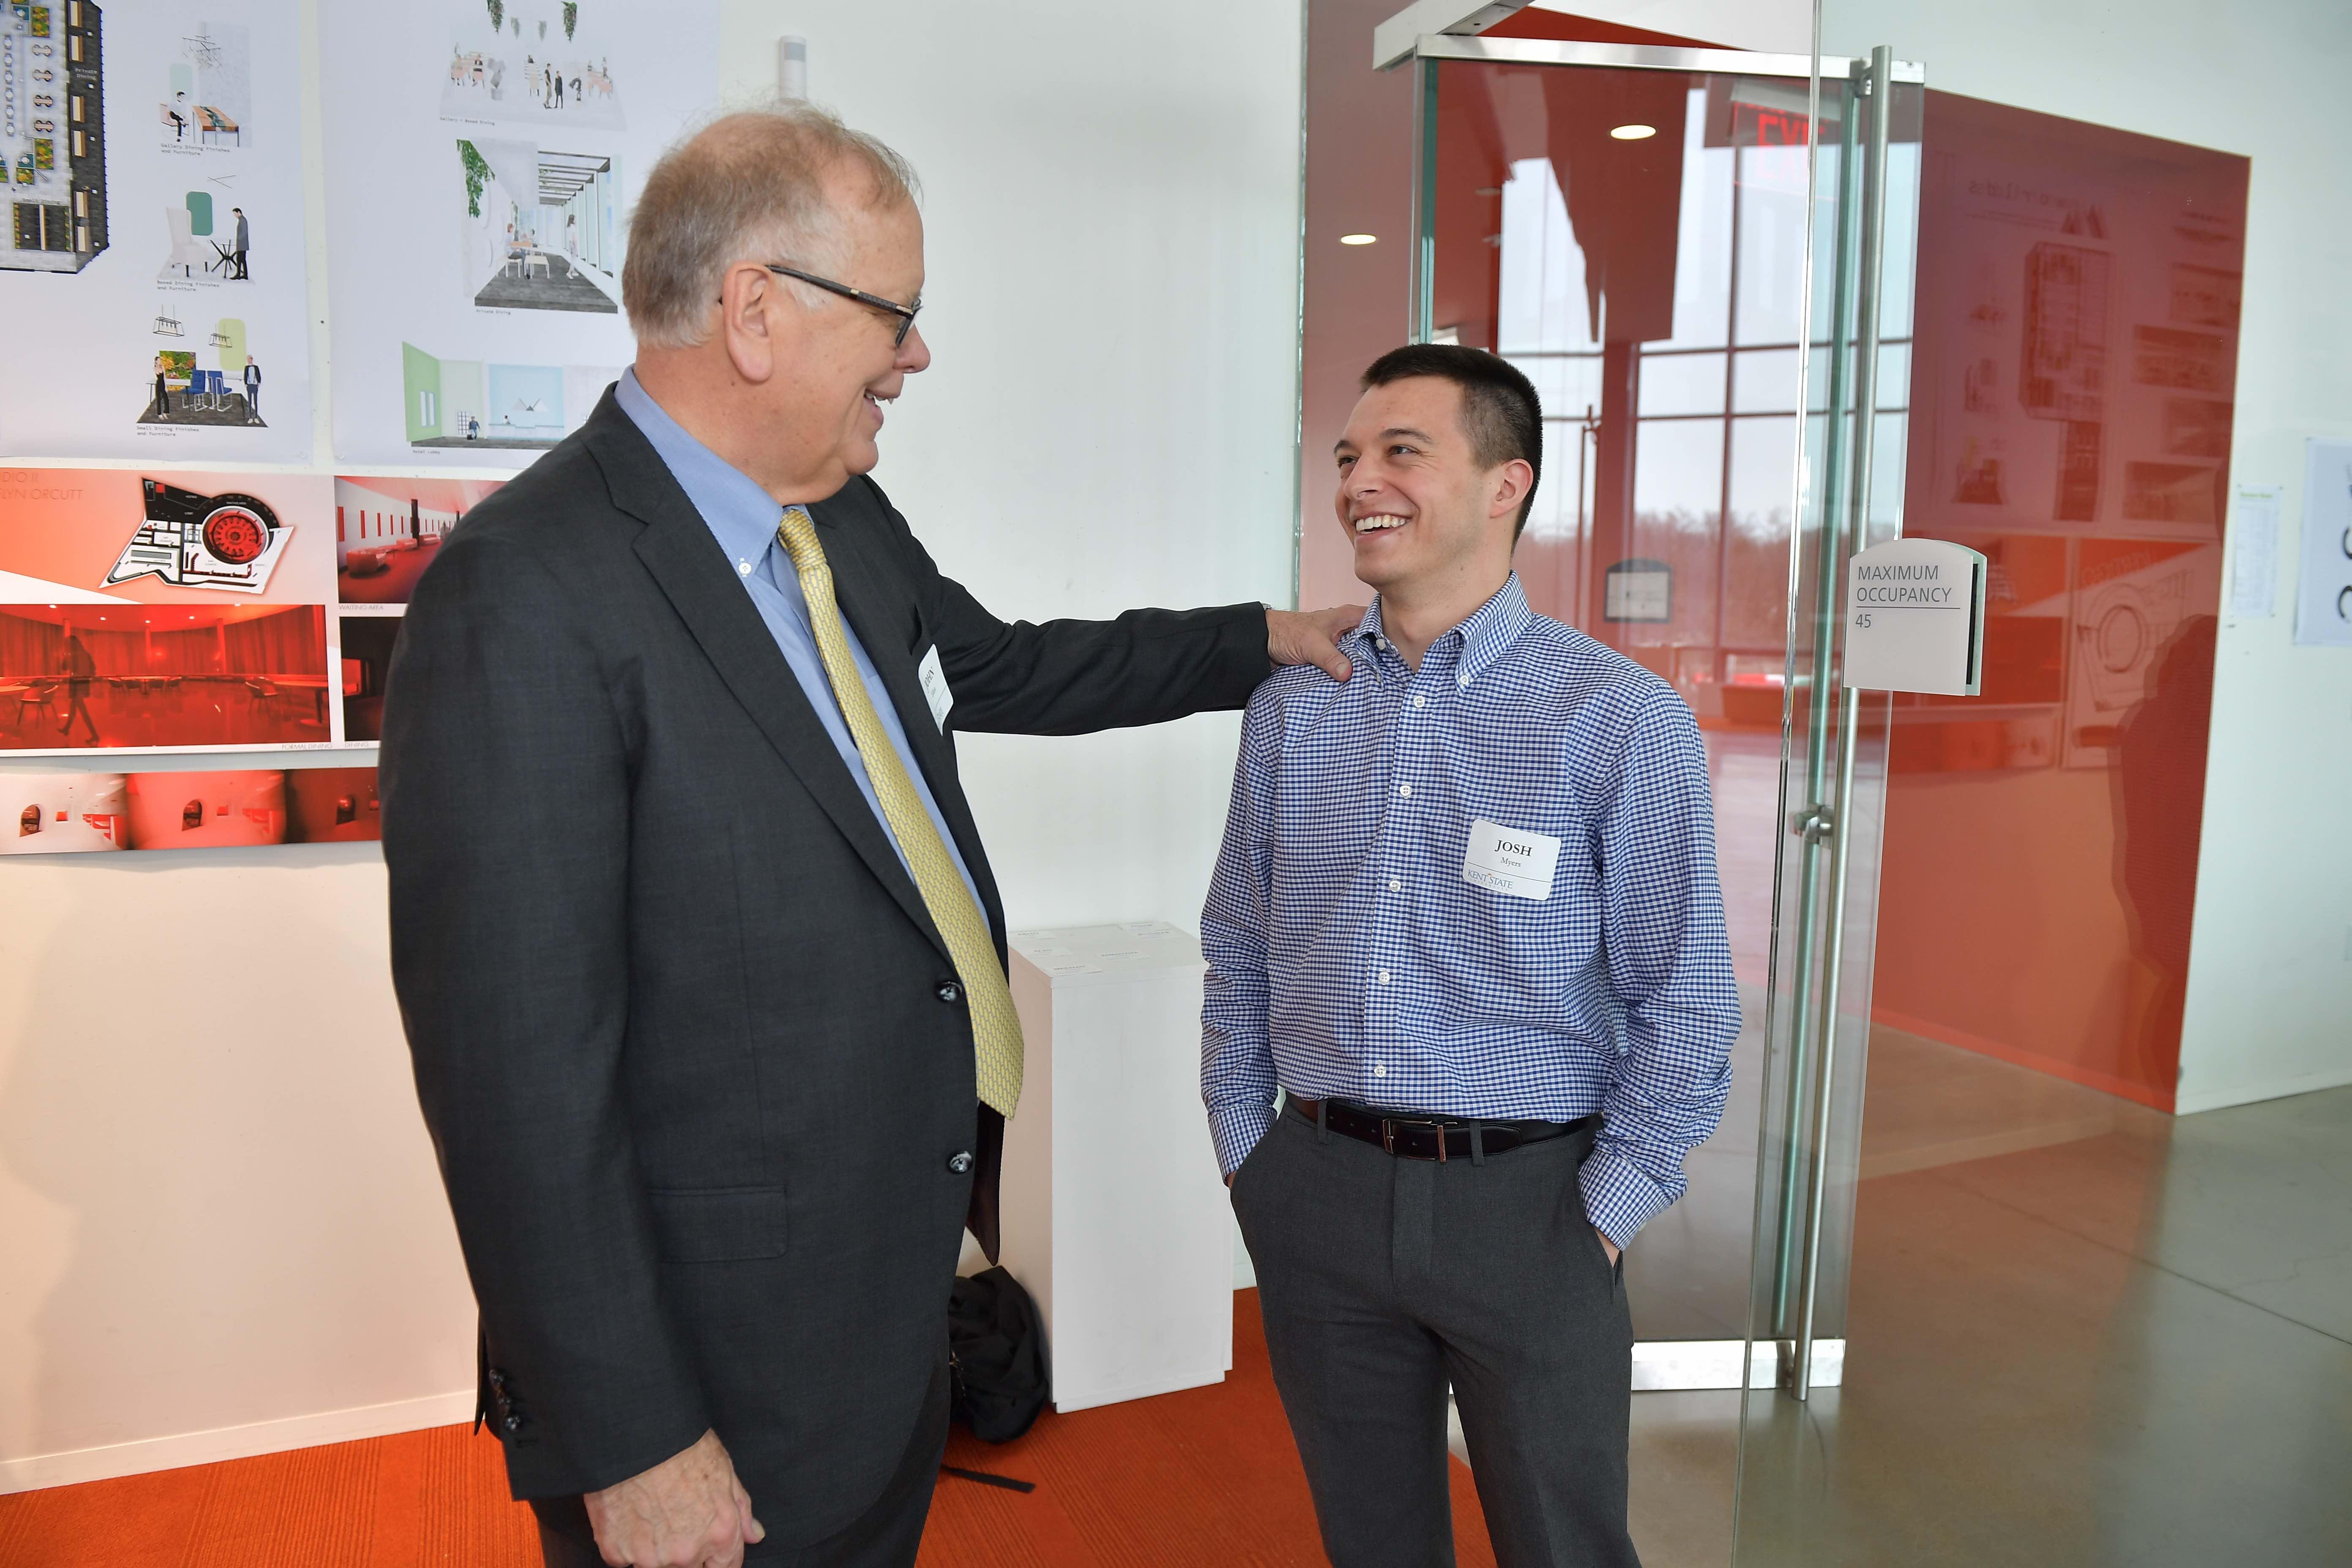 John Elliot talking with a student